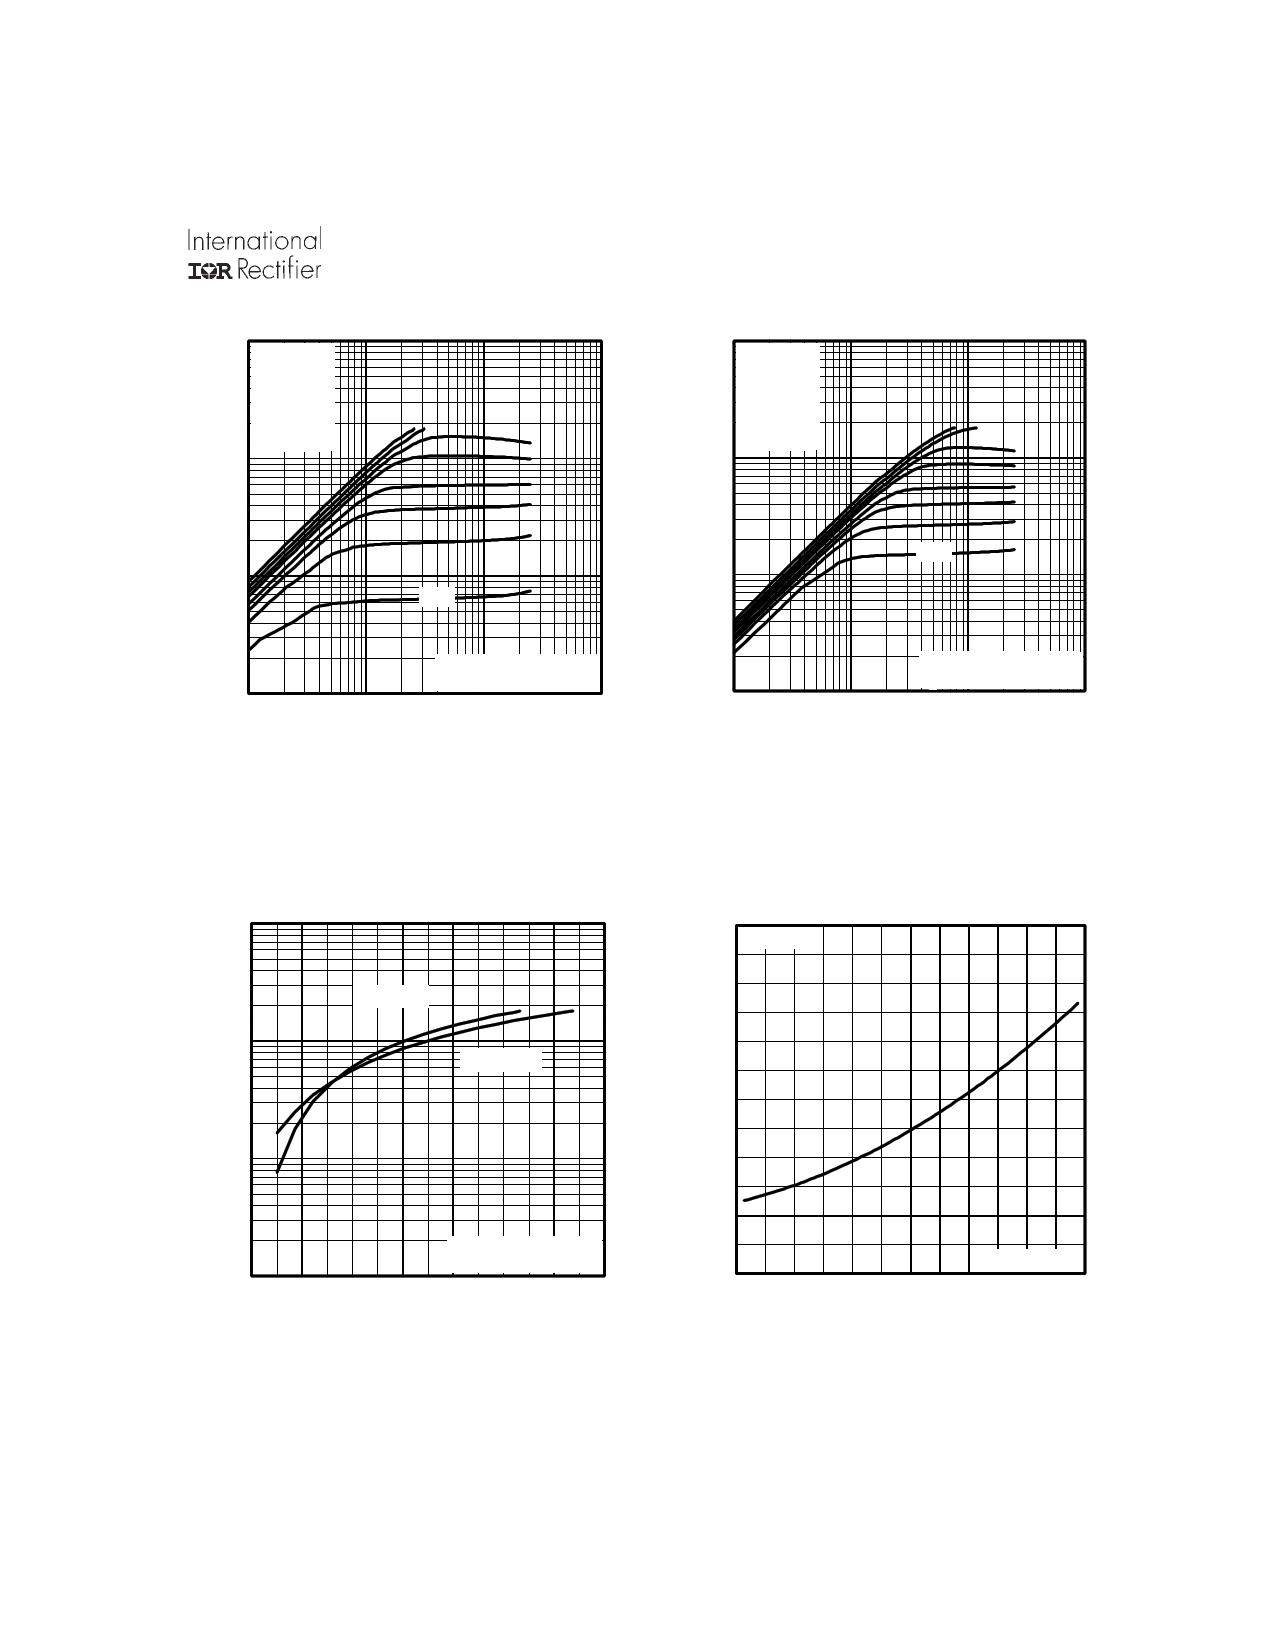 IRFZ46N pdf, ピン配列